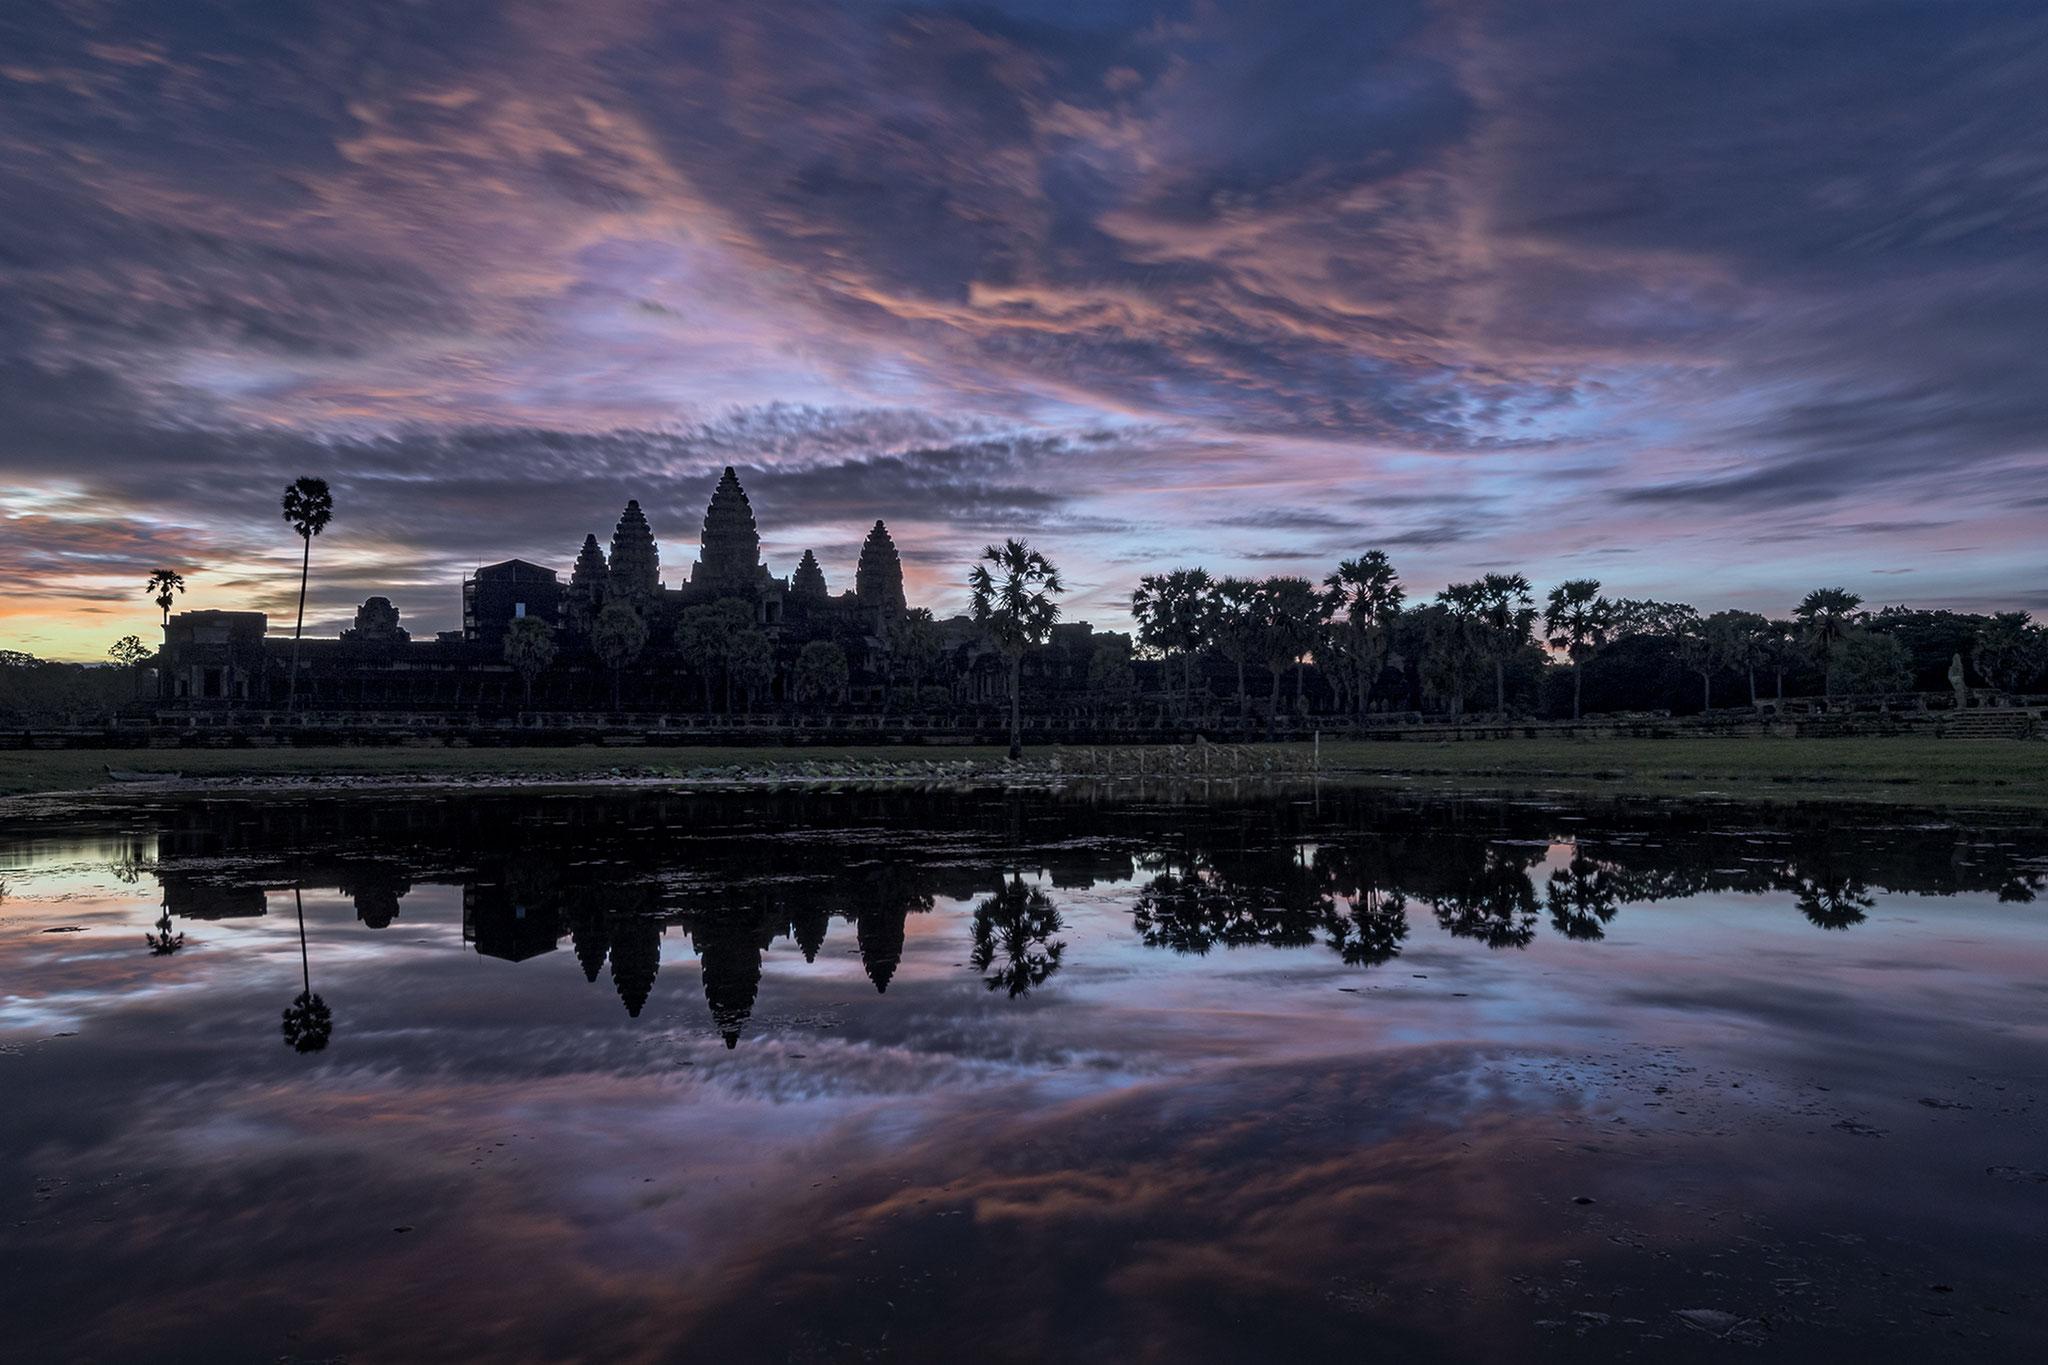 Veronica Chai (Singapore) - Sunrise Reflection